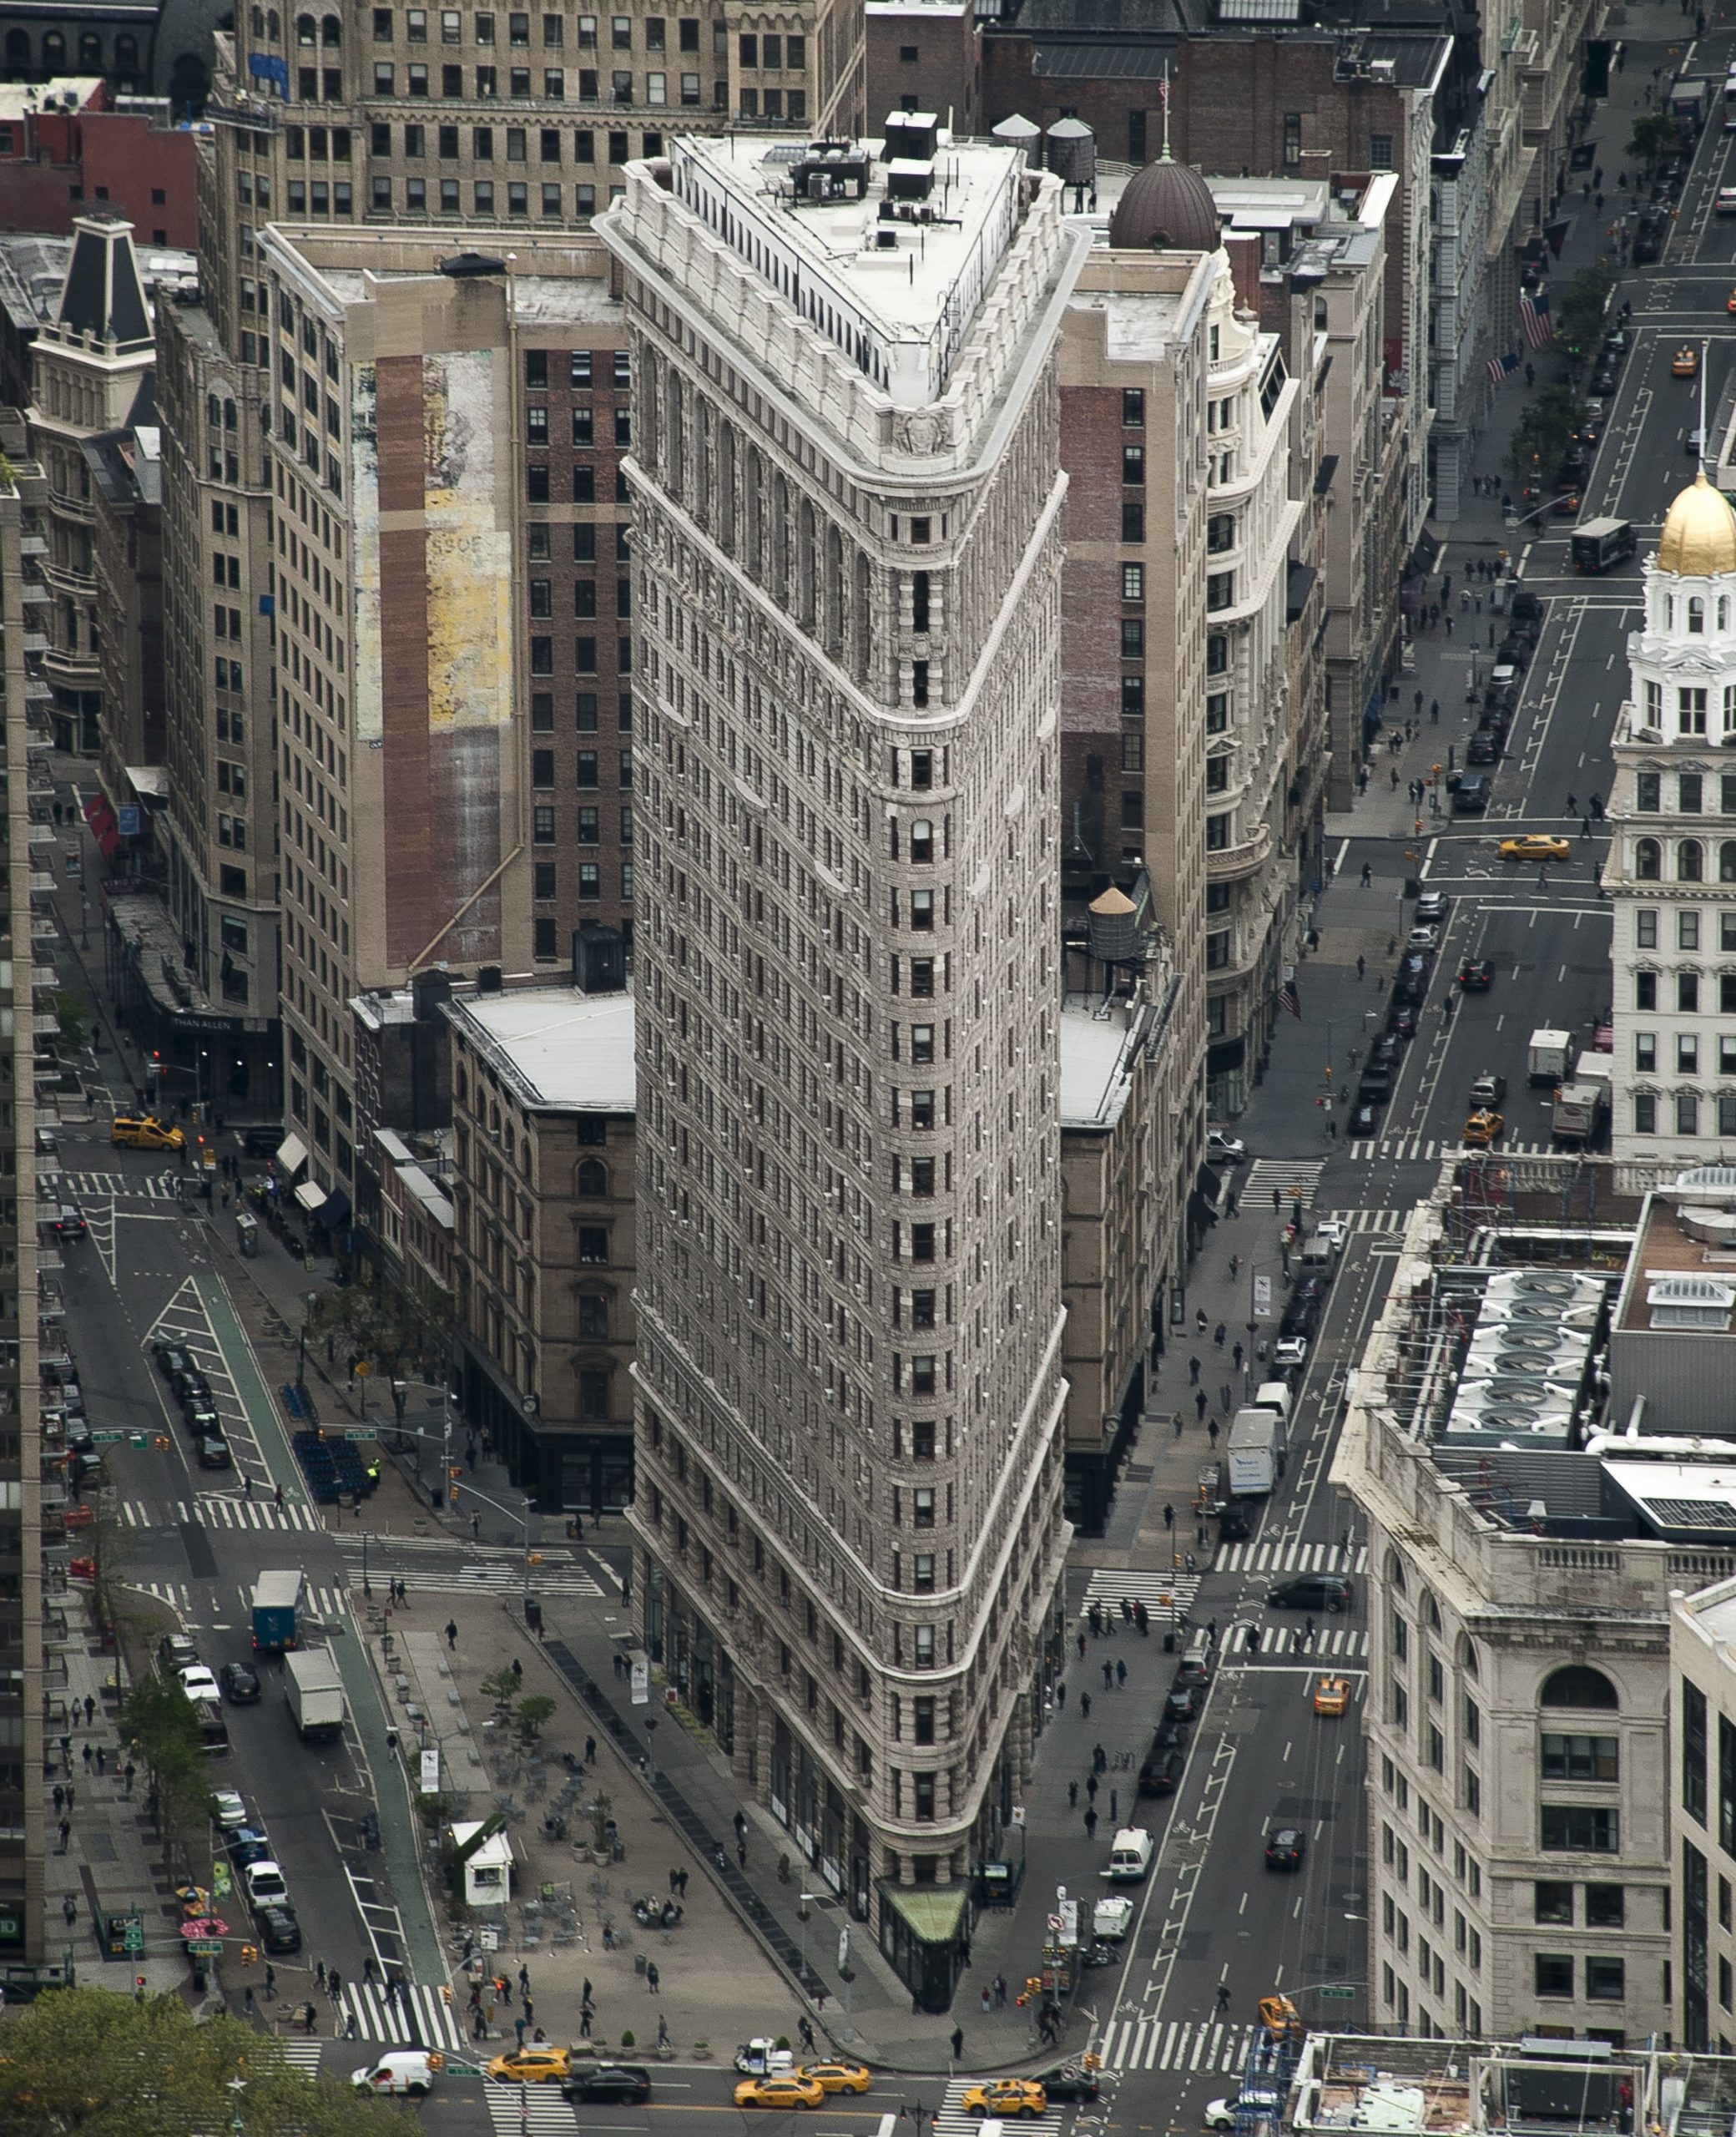 Flatiron Building Overview